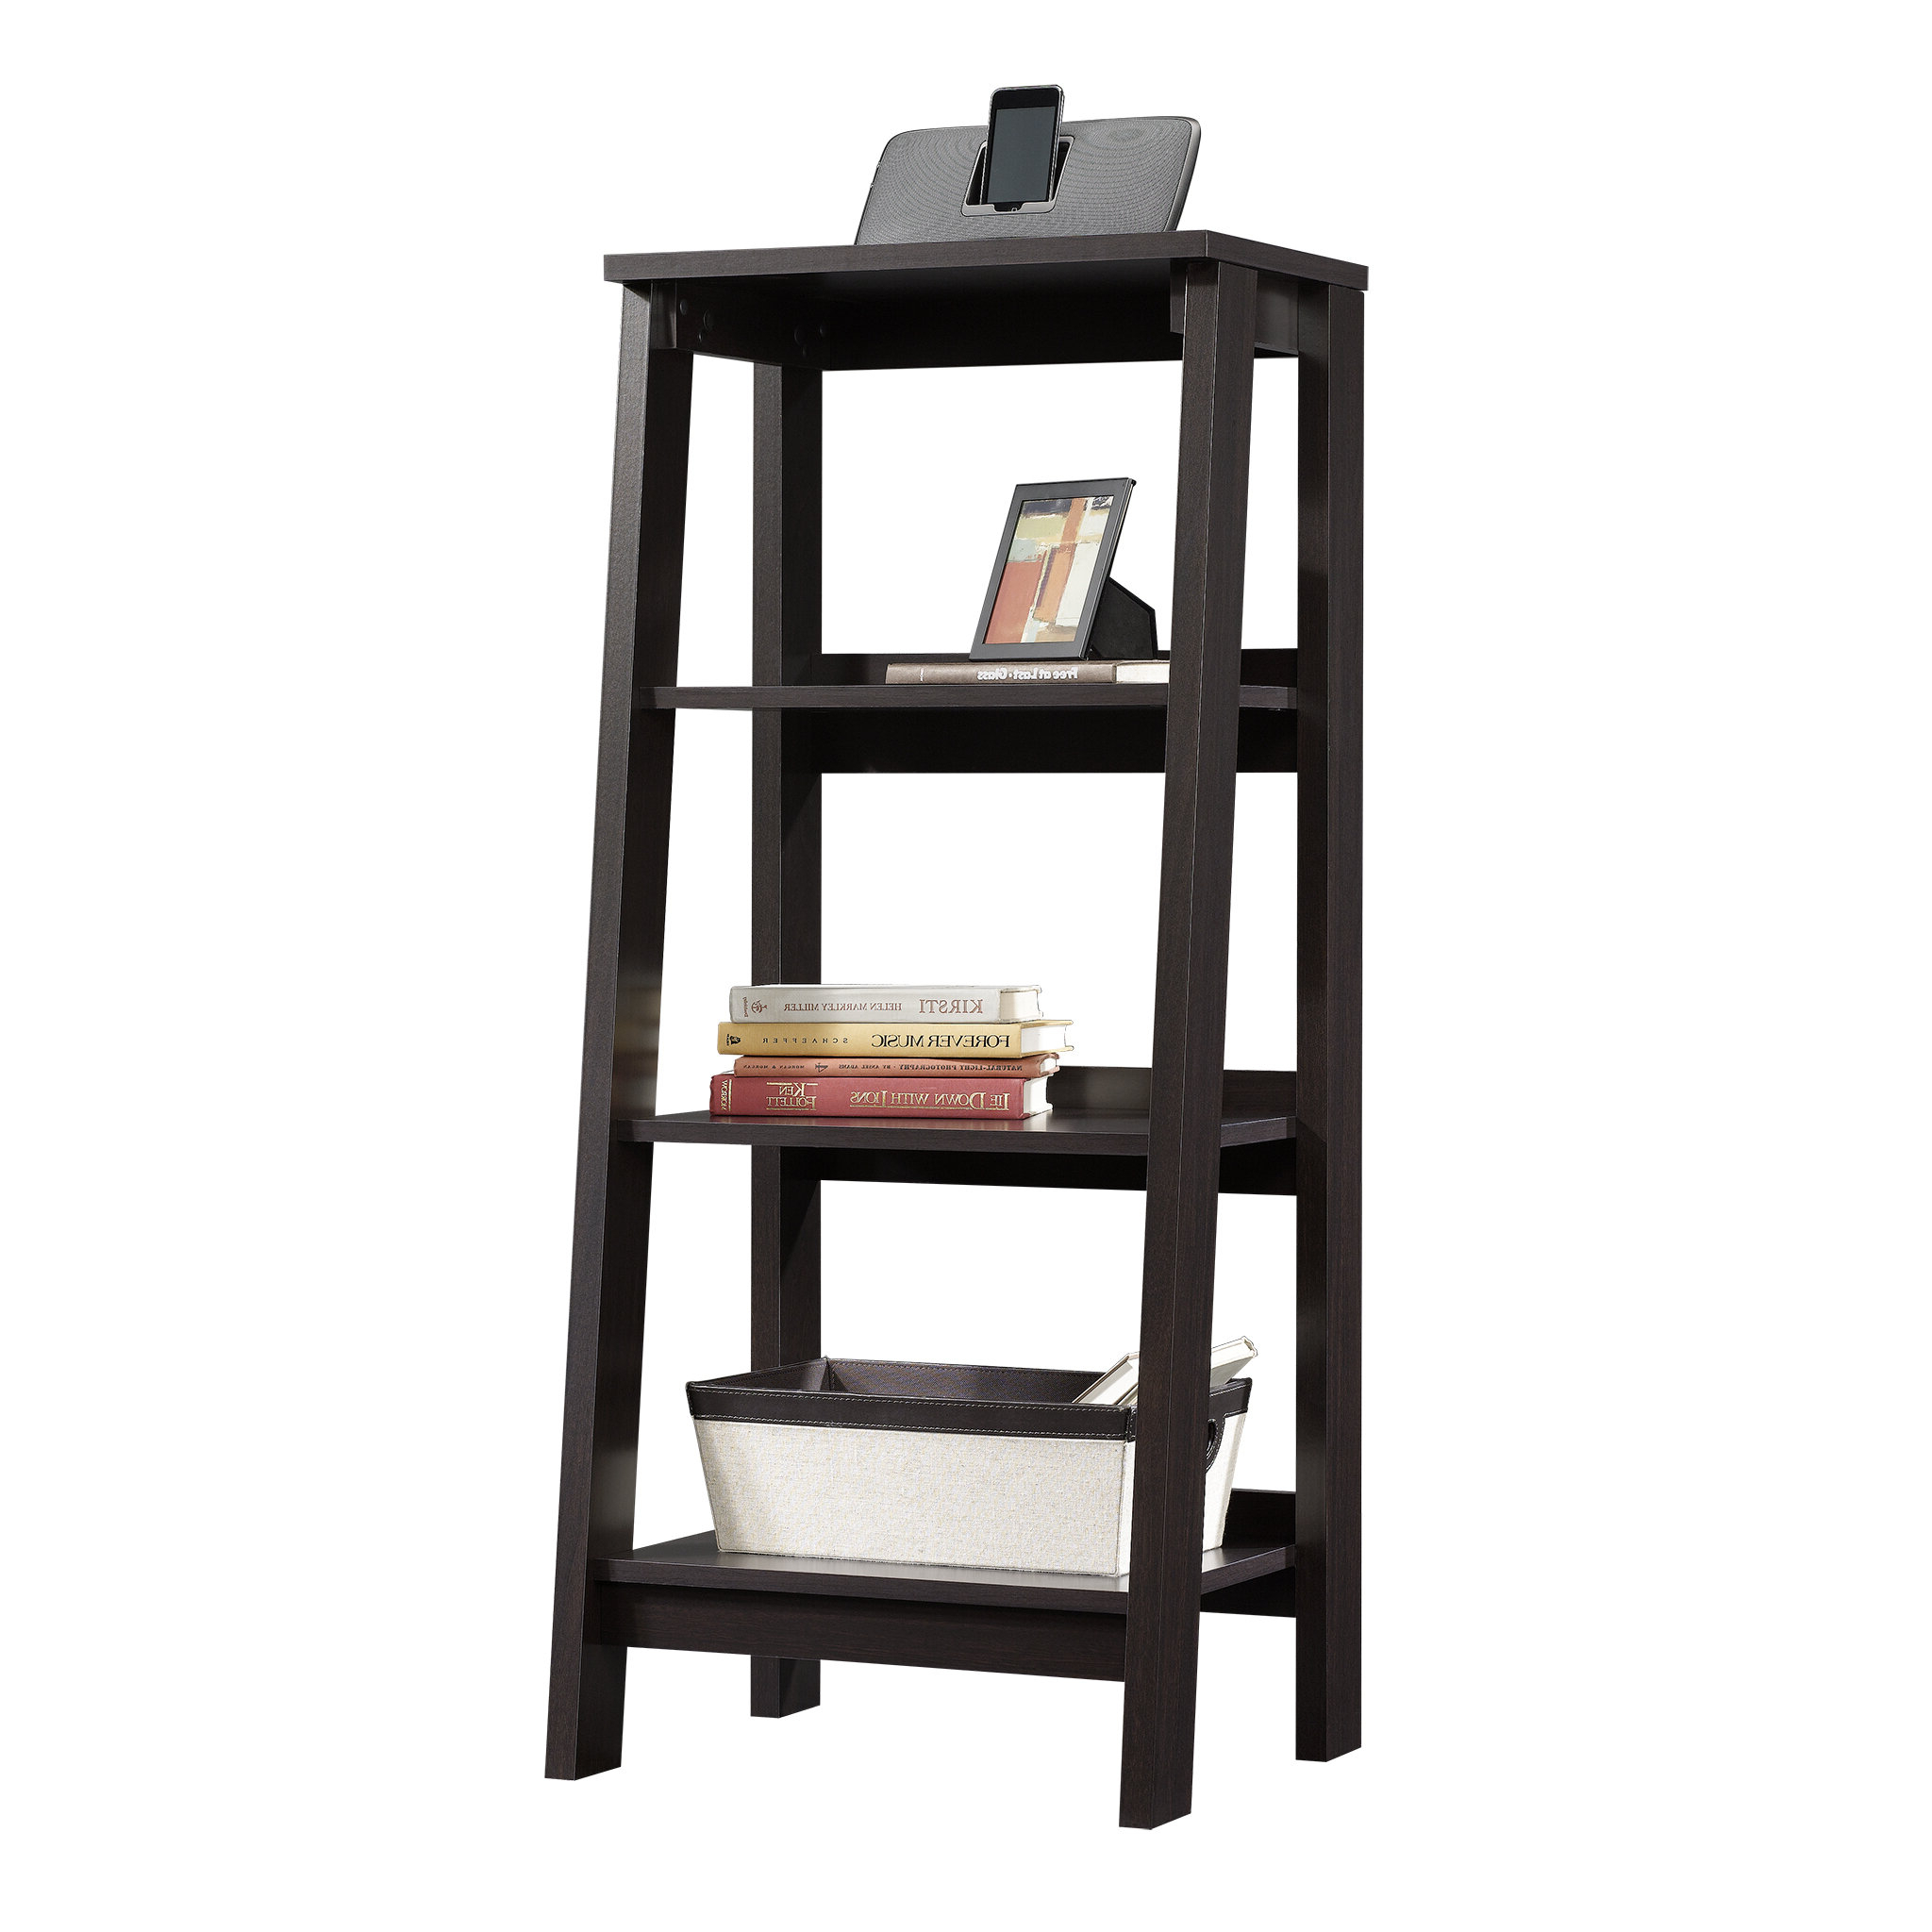 Averett Ladder Bookcases Regarding Current Massena Ladder Bookcase (View 19 of 20)